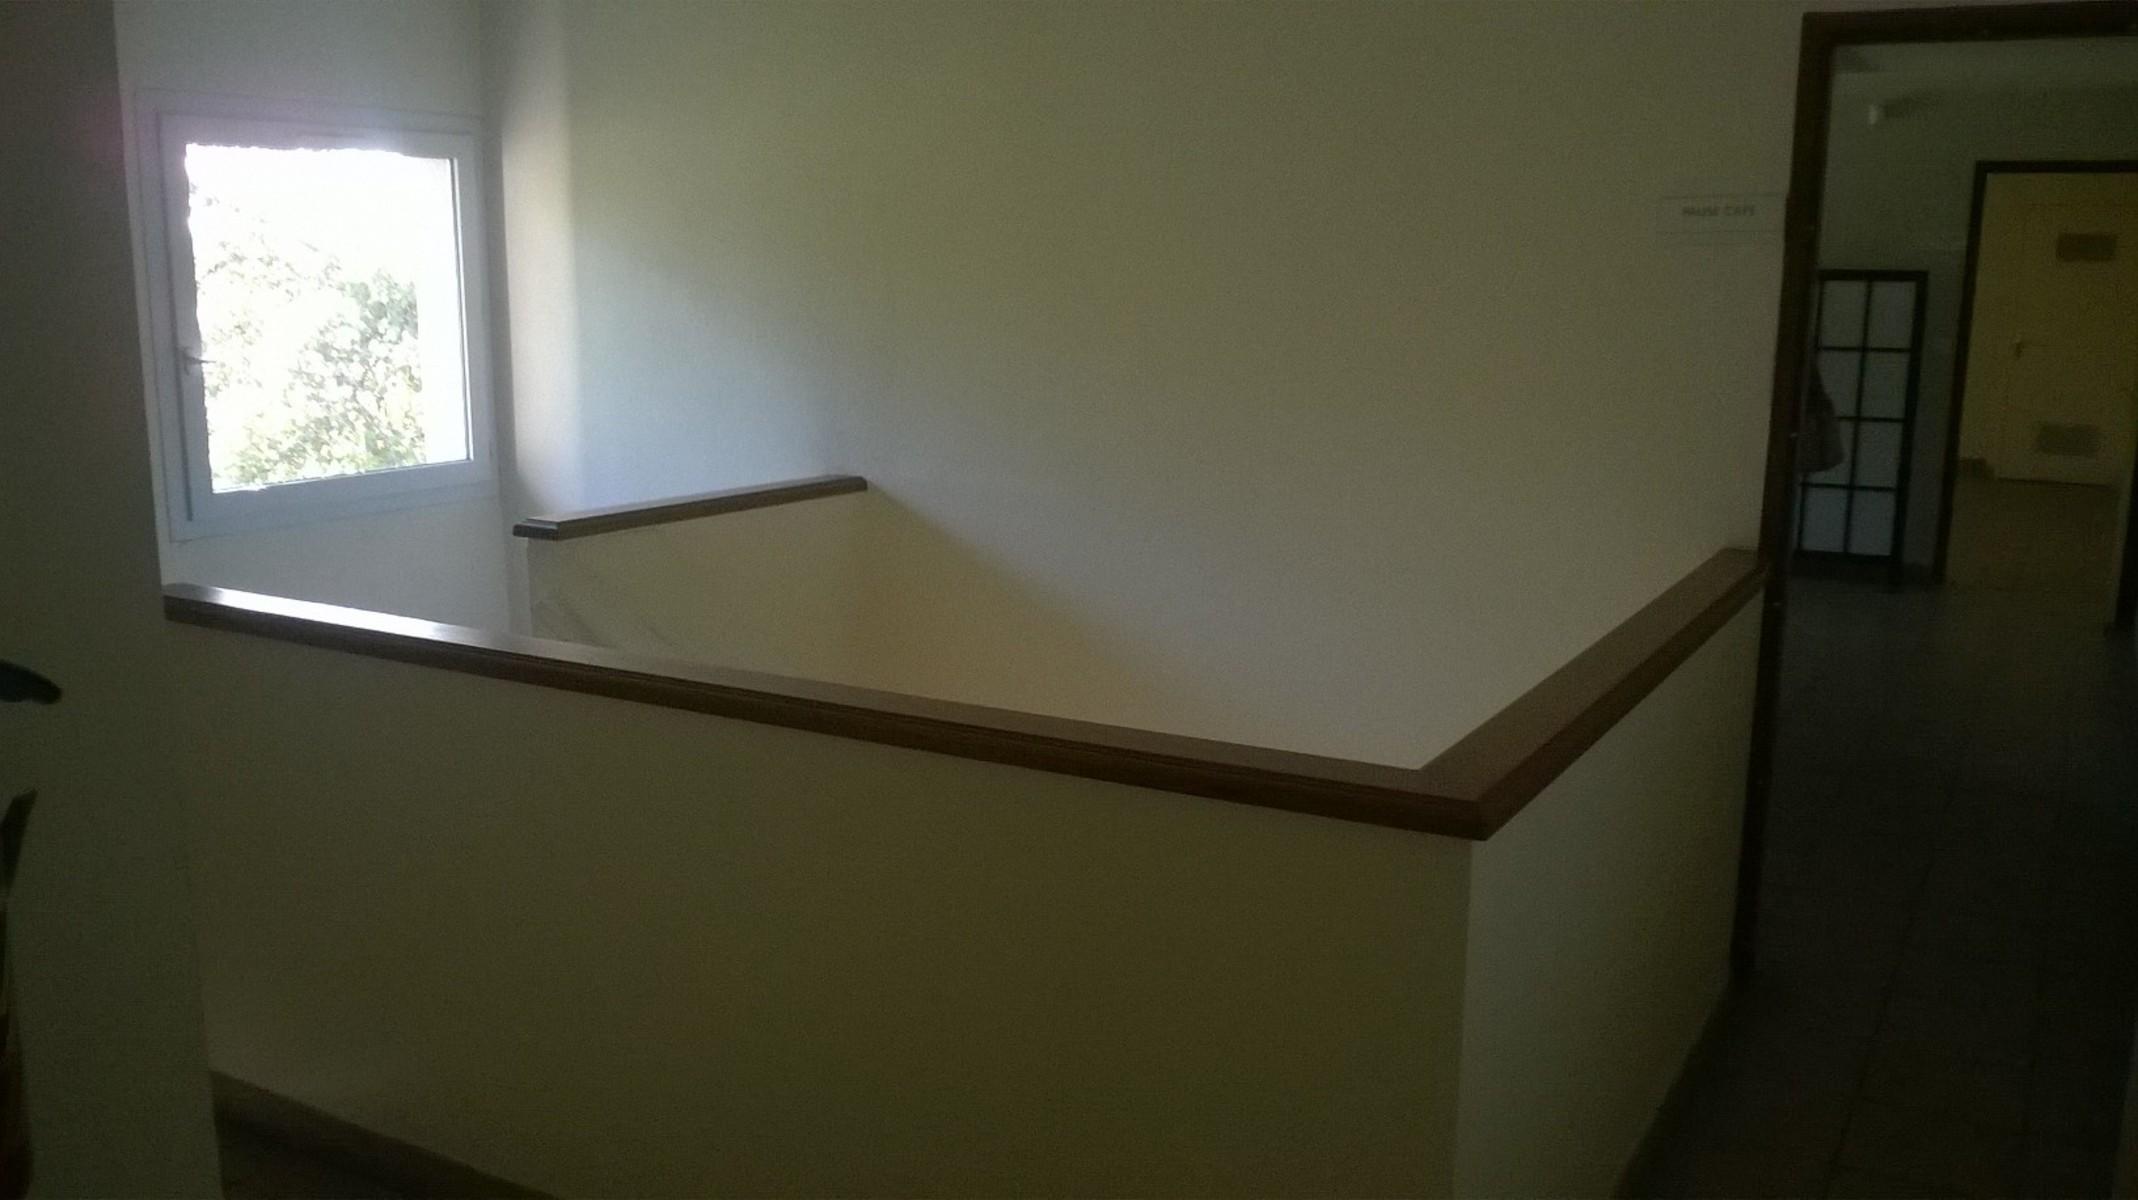 annonces immobili res a roport de n mes al s camargue c vennes. Black Bedroom Furniture Sets. Home Design Ideas